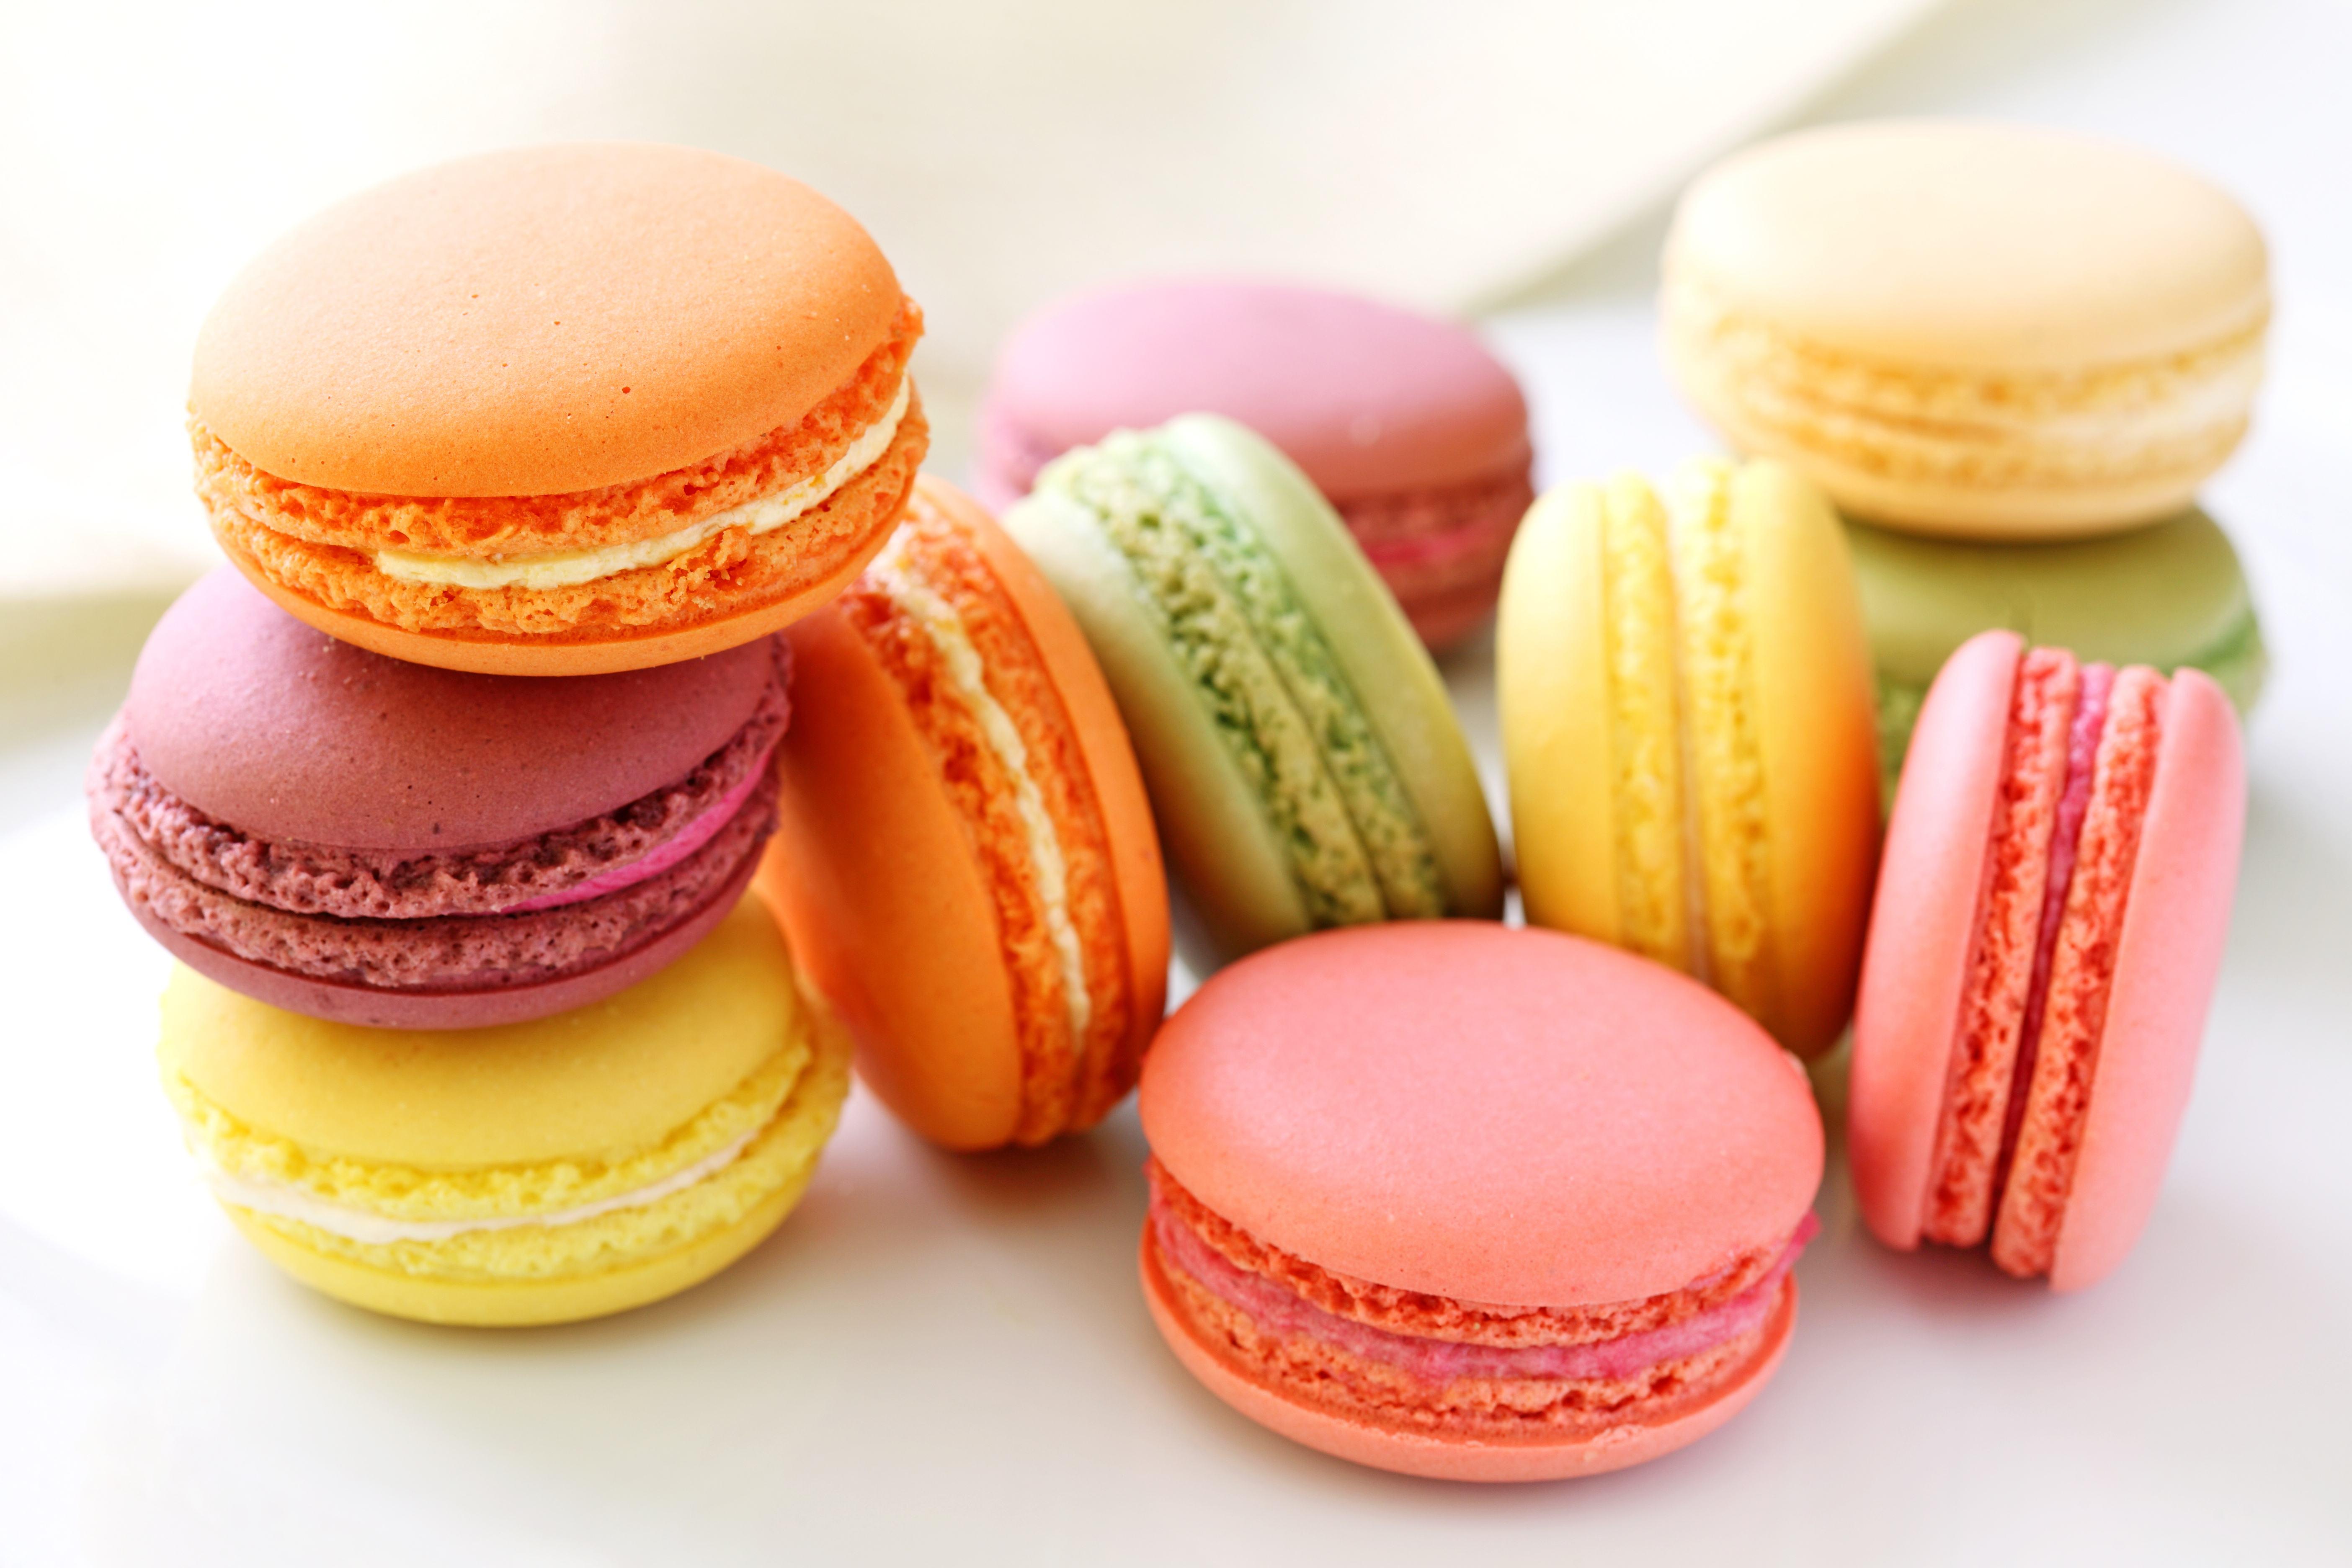 Macaron Image